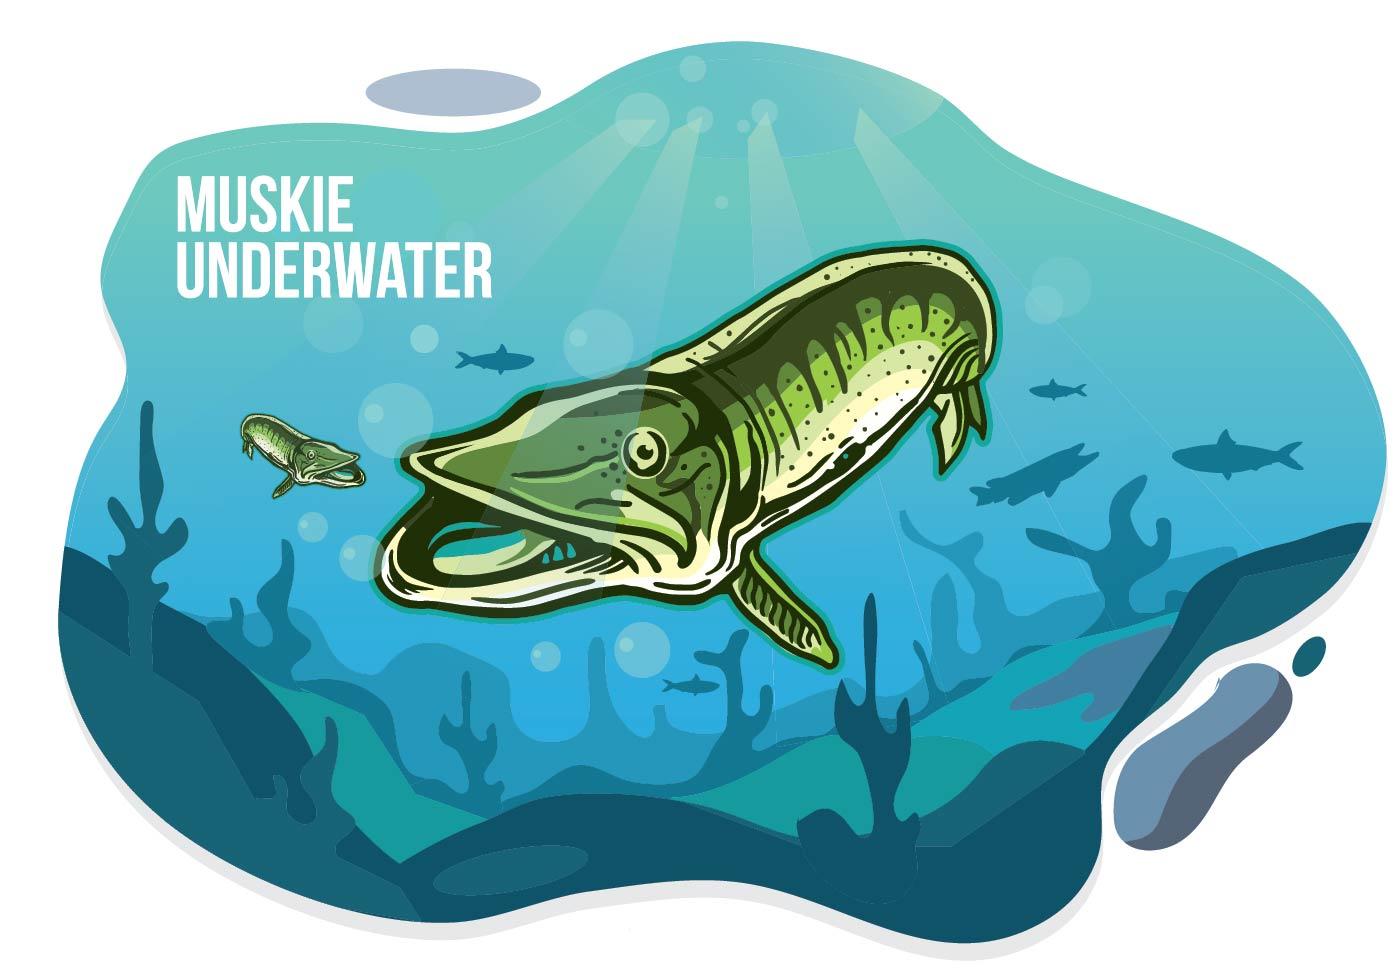 Muskie Underwater Illustration - Download Free Vector Art ...